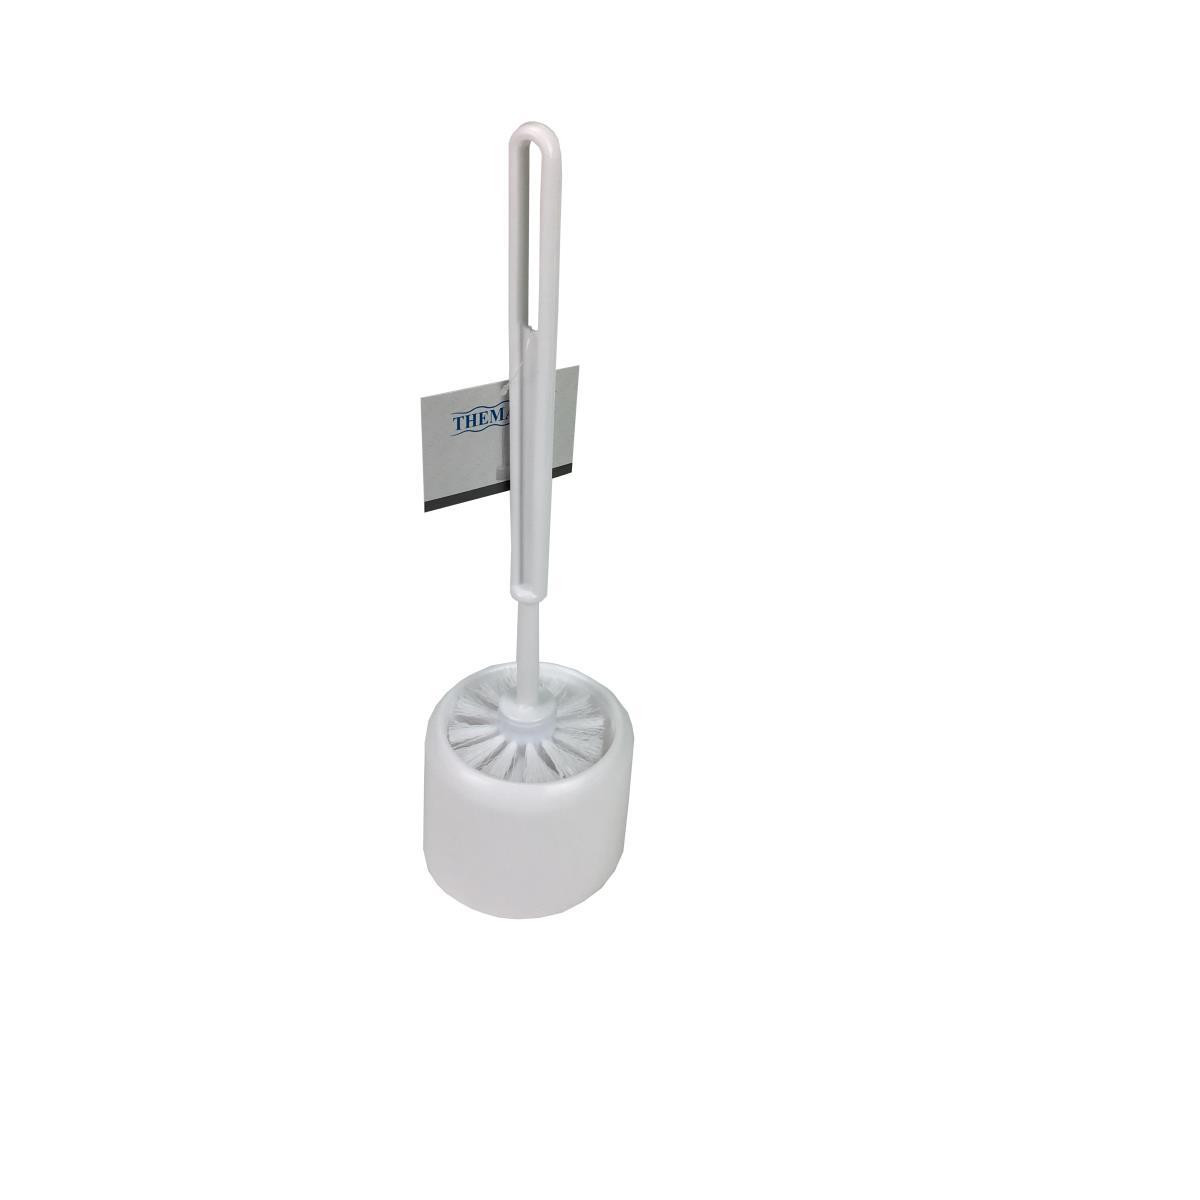 WC Garnitur Toilettenbürste Klobürste Bürstengarnitur Bürste WC-Bürste ,Thema Lux,000051116272, 6926106302265